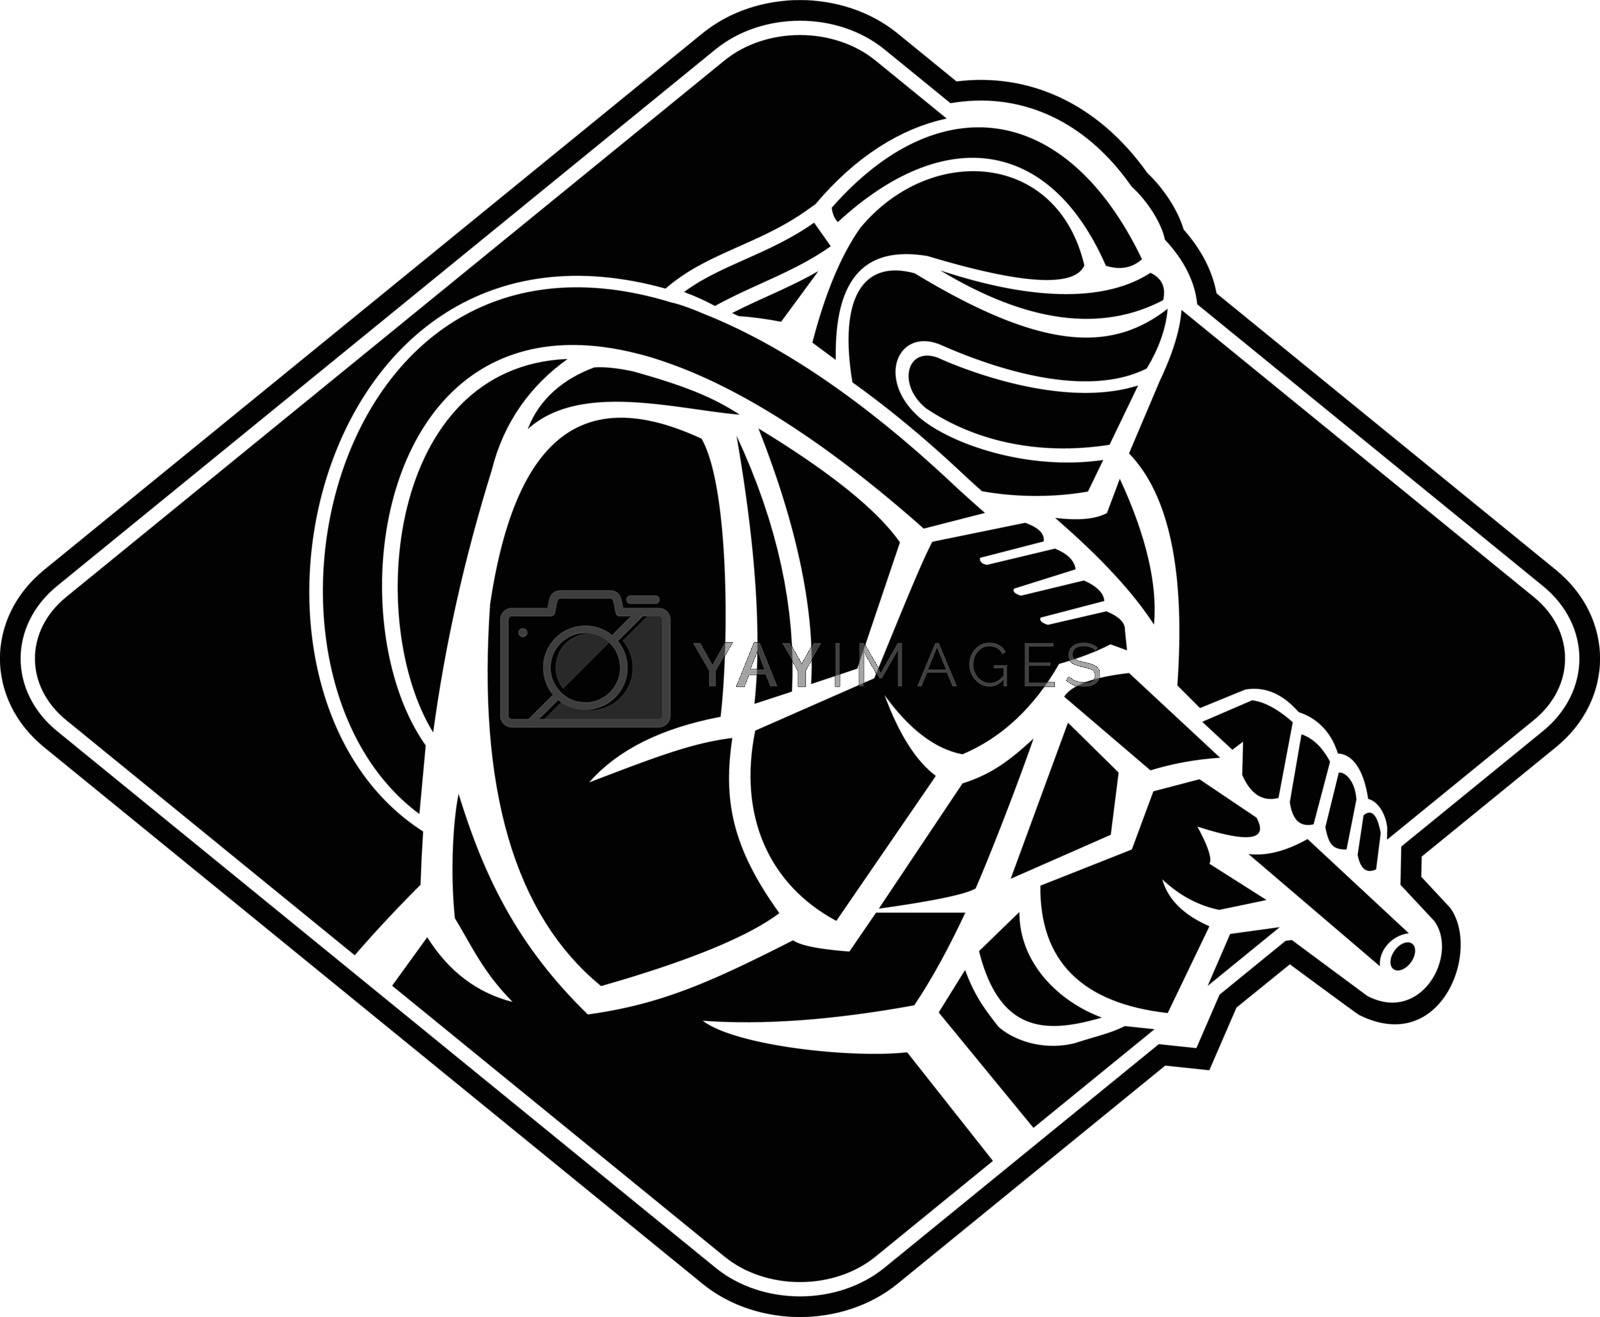 Stencil black and white Illustration of a sandblaster worker holding sandblasting hose wearing helmet visor set inside diamond shape done in retro style.